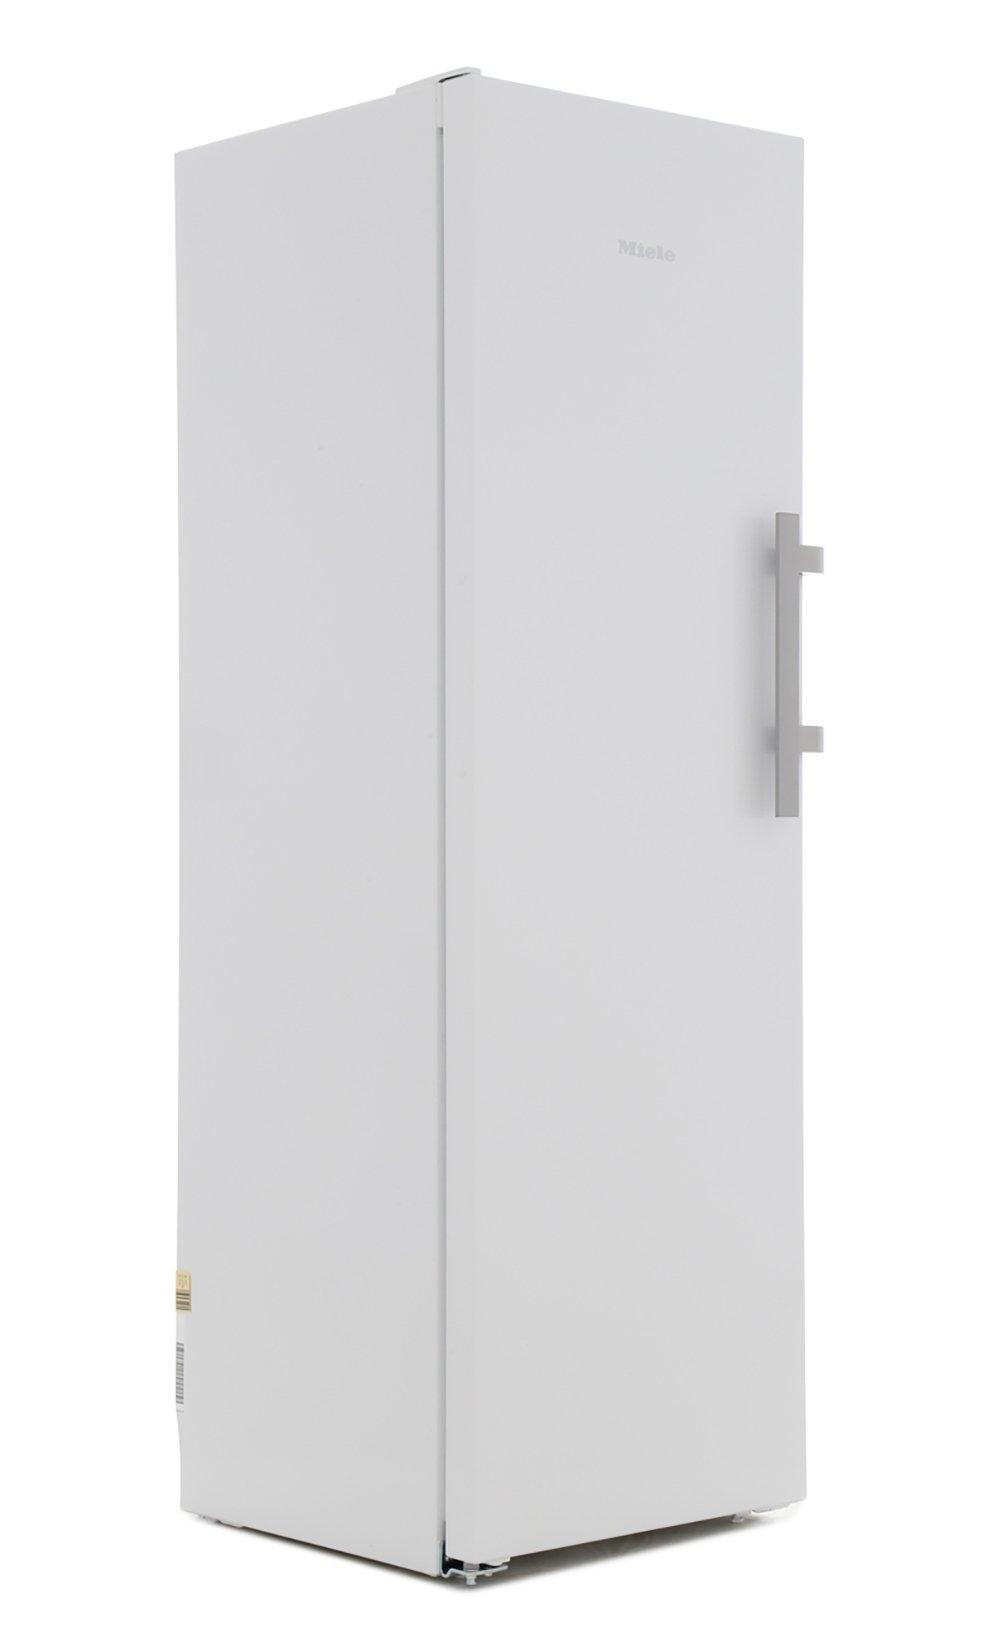 Miele FN28262 White Frost Free Tall Freezer